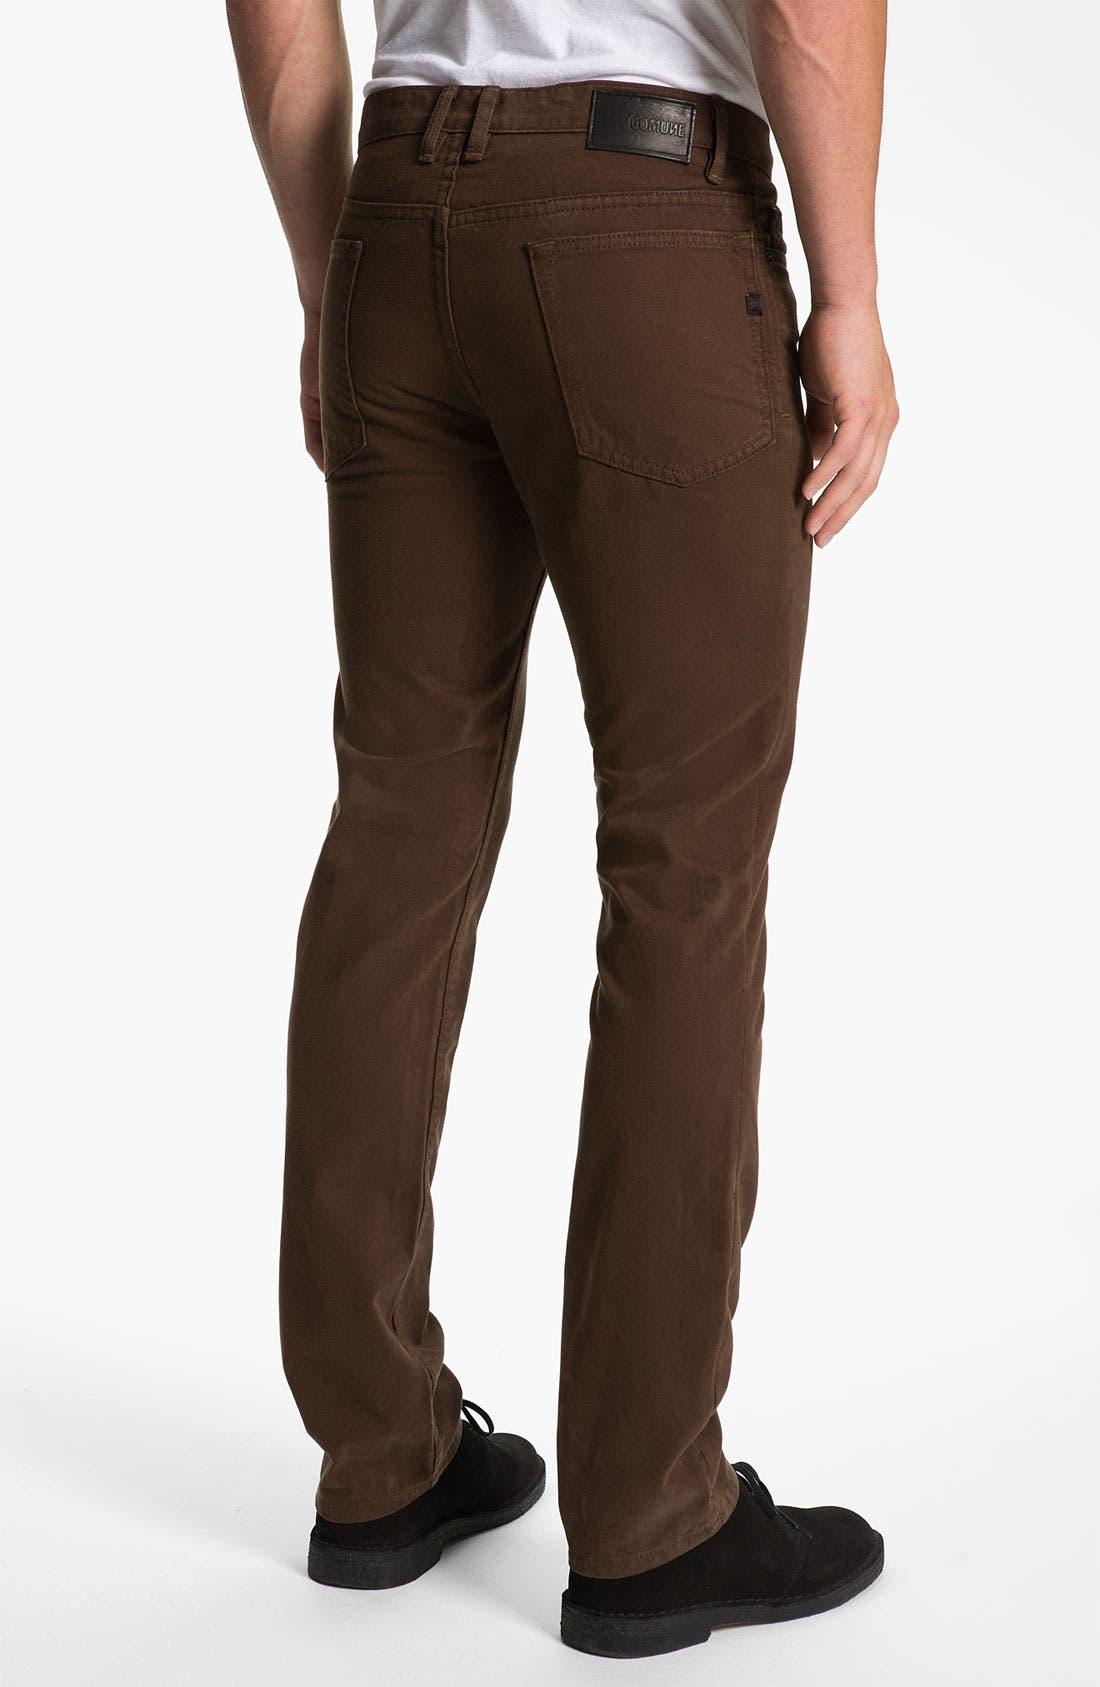 Alternate Image 1 Selected - Comune 'Ricky' Slim Straight Leg Jeans (Espresso)